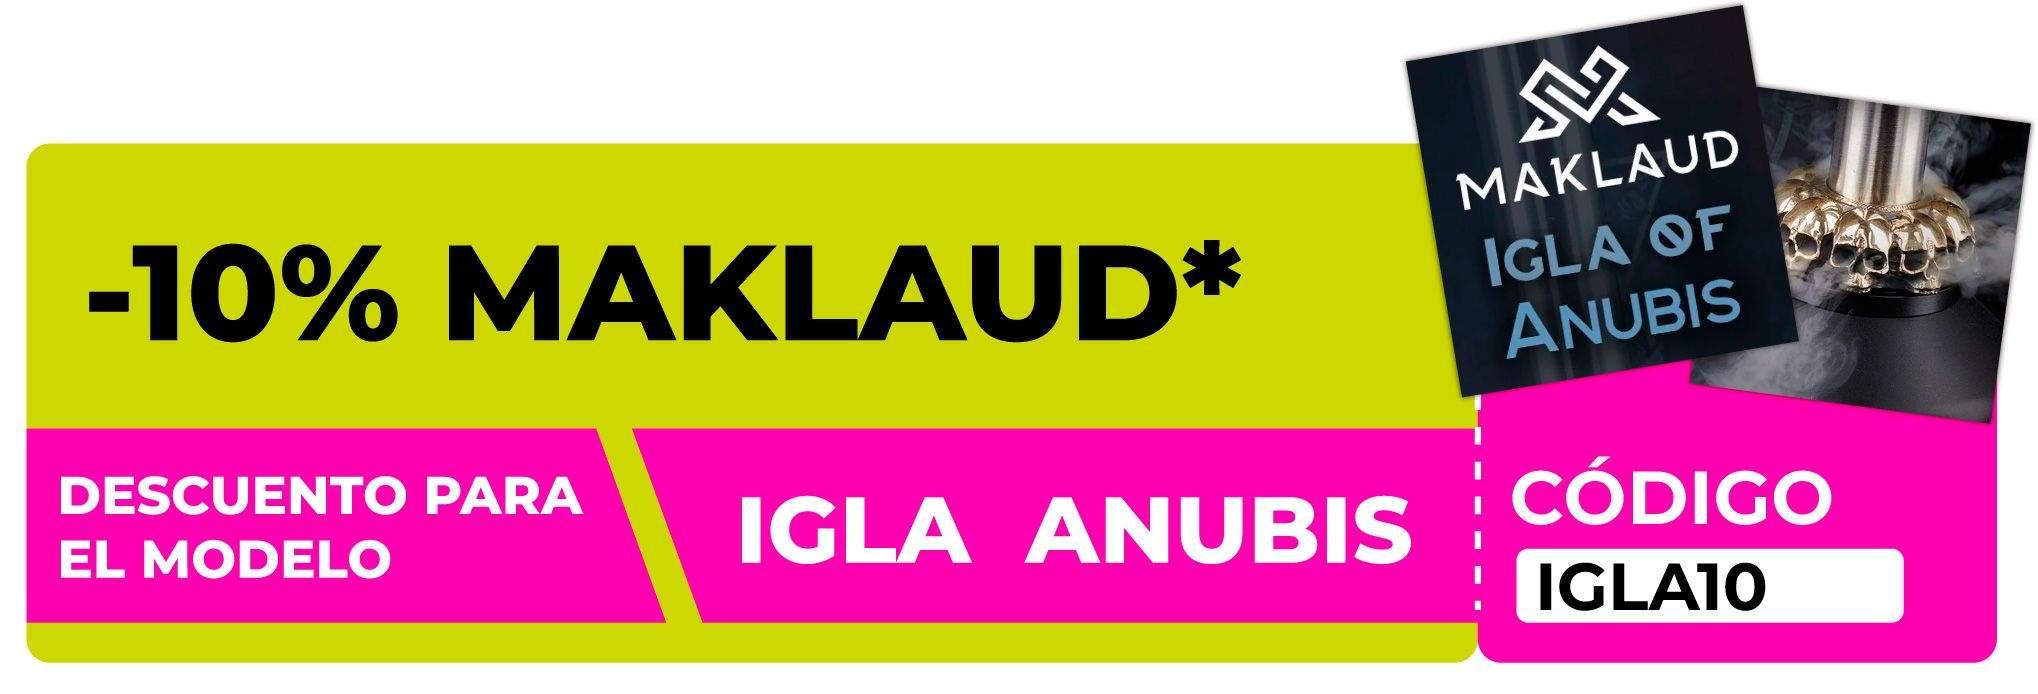 igla10-es.jpg